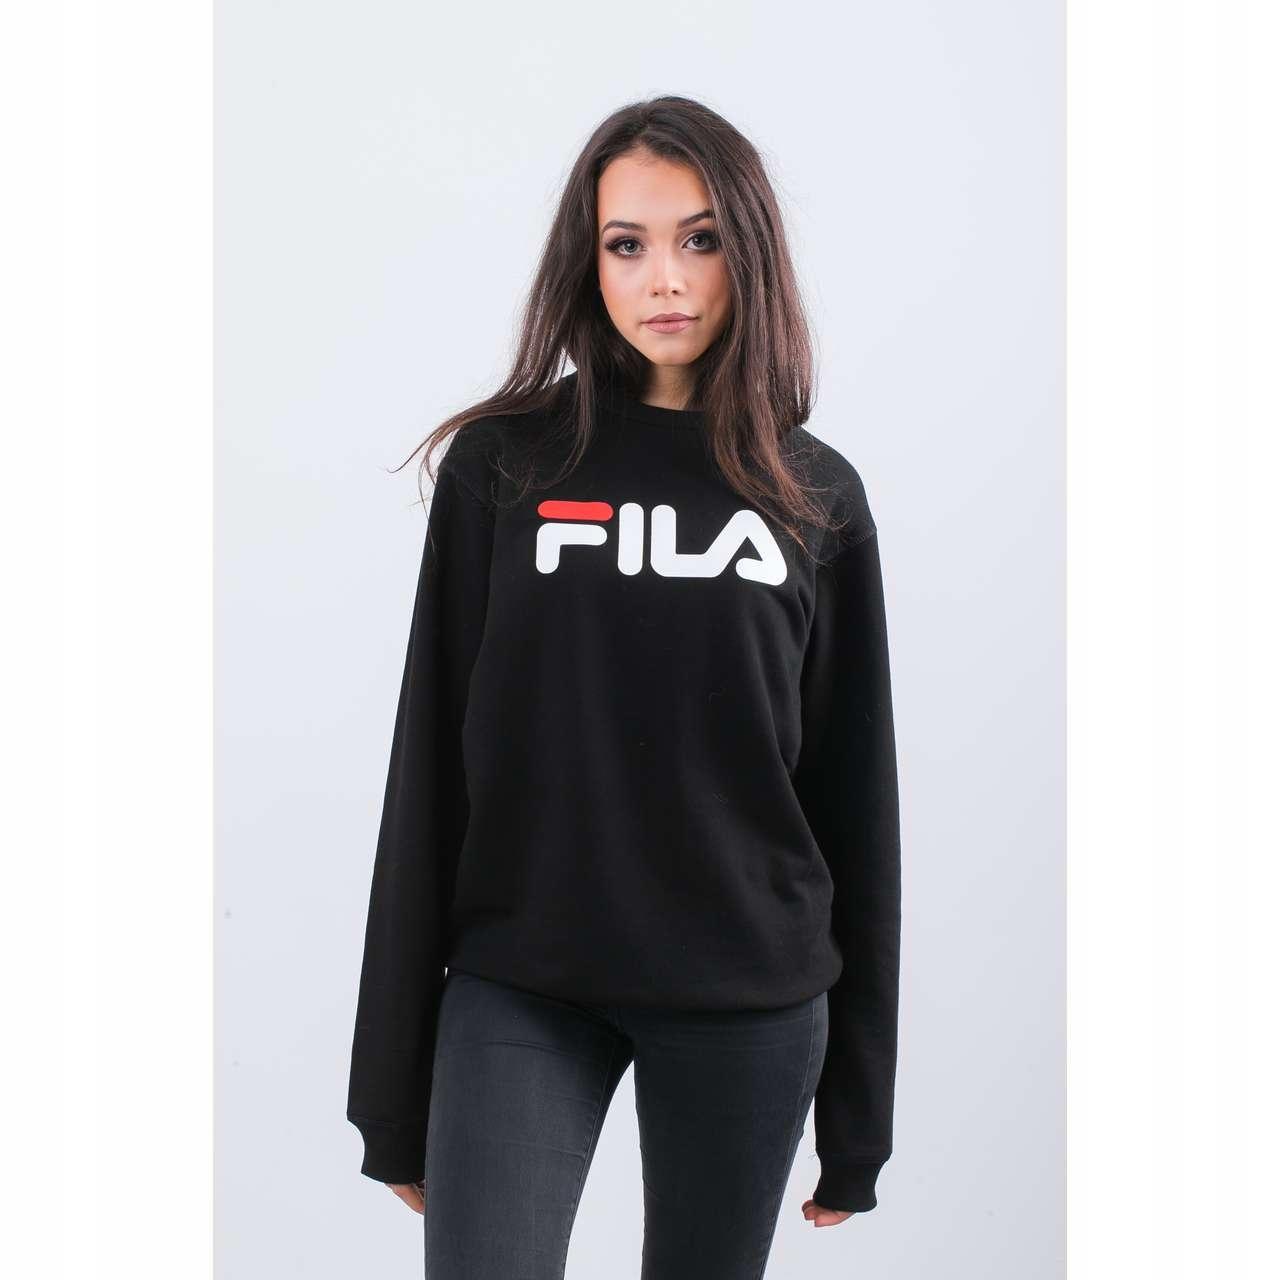 Pure crew sweat 002 black xs (Fila)